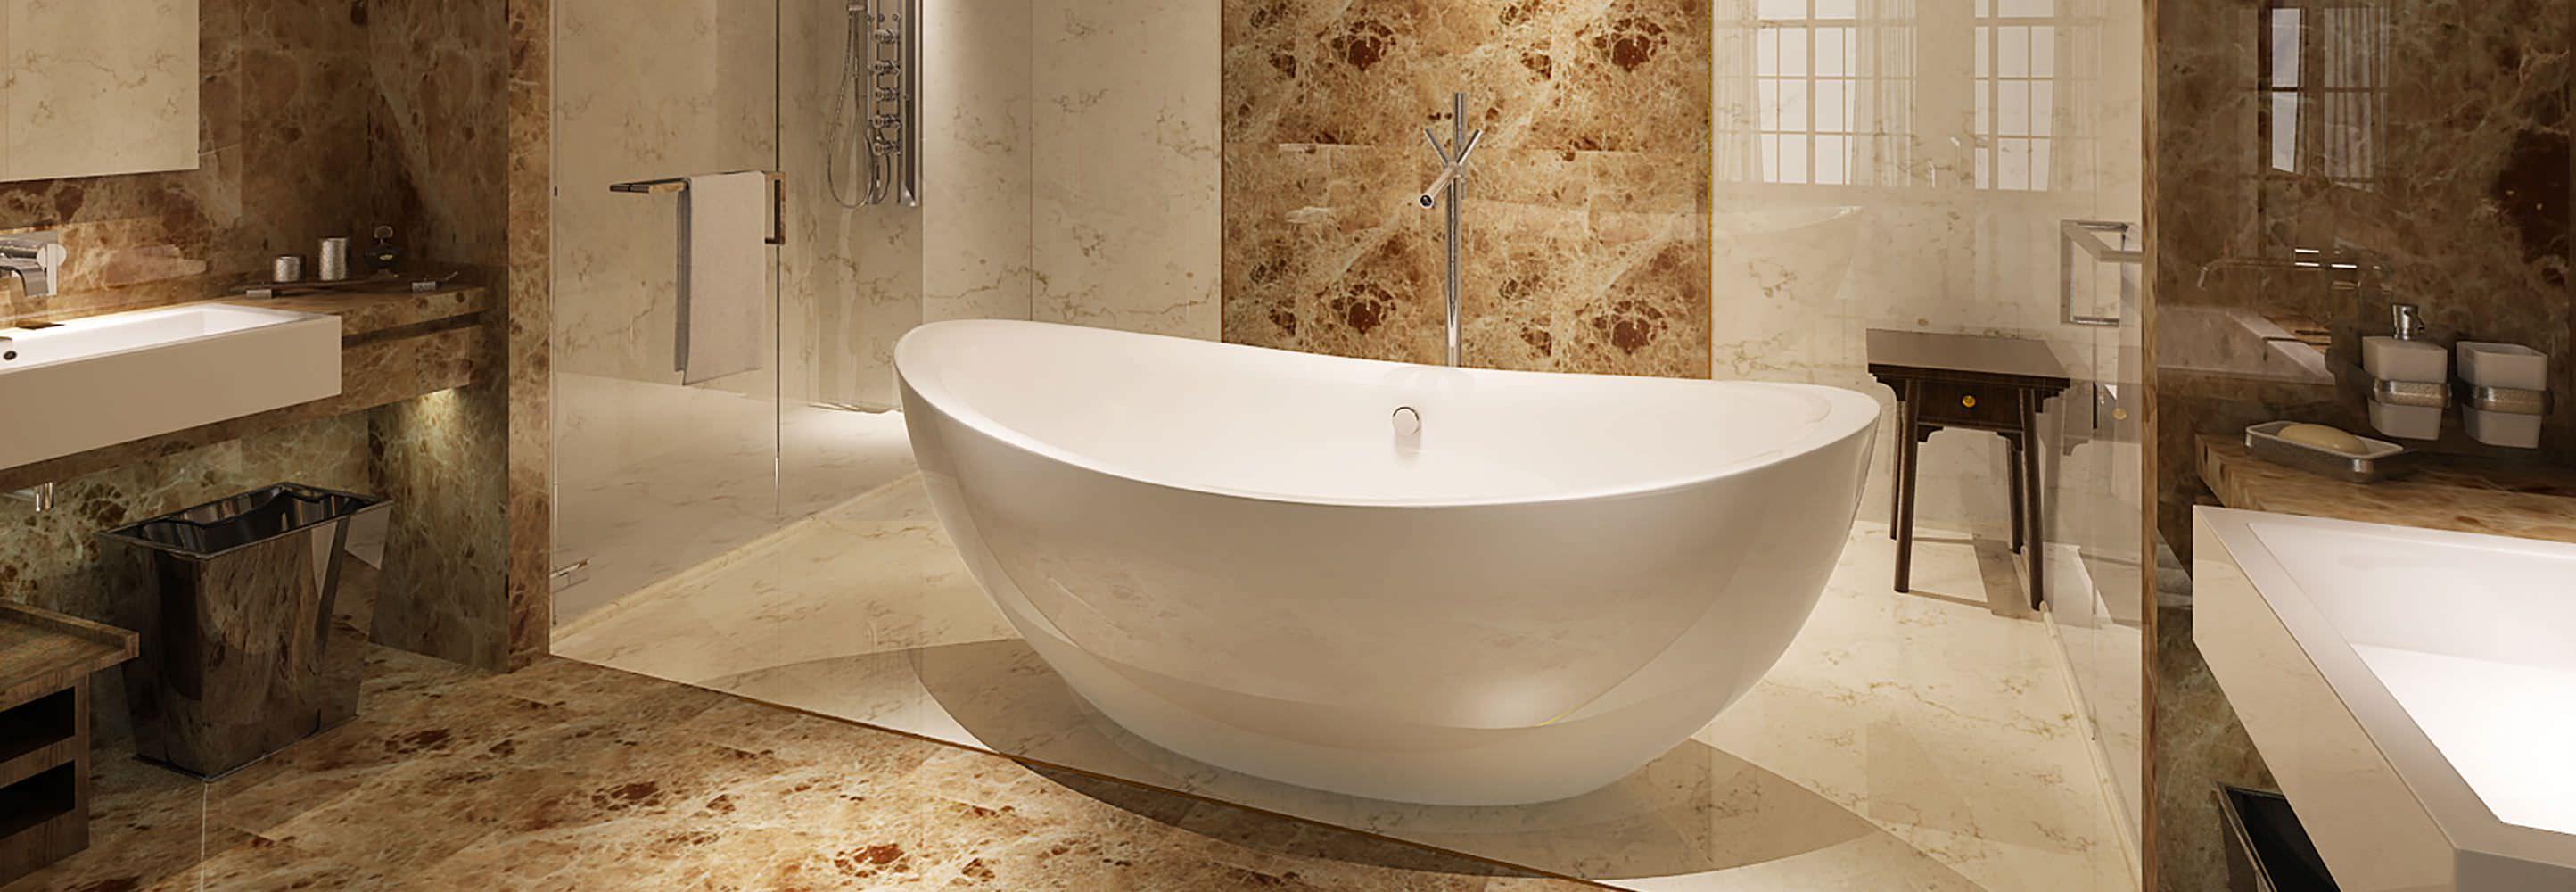 HelixBath Tholos Freestanding Pedestal Modern Tub